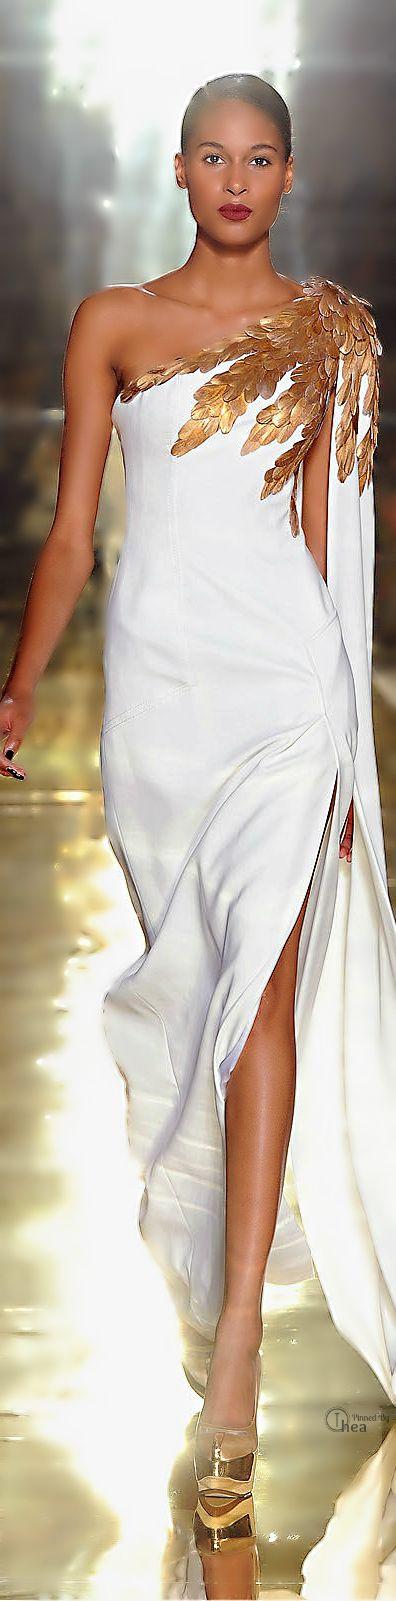 Glamness couture glam me pinterest kl nningar for Prix de robe de mariage en or georges chakra